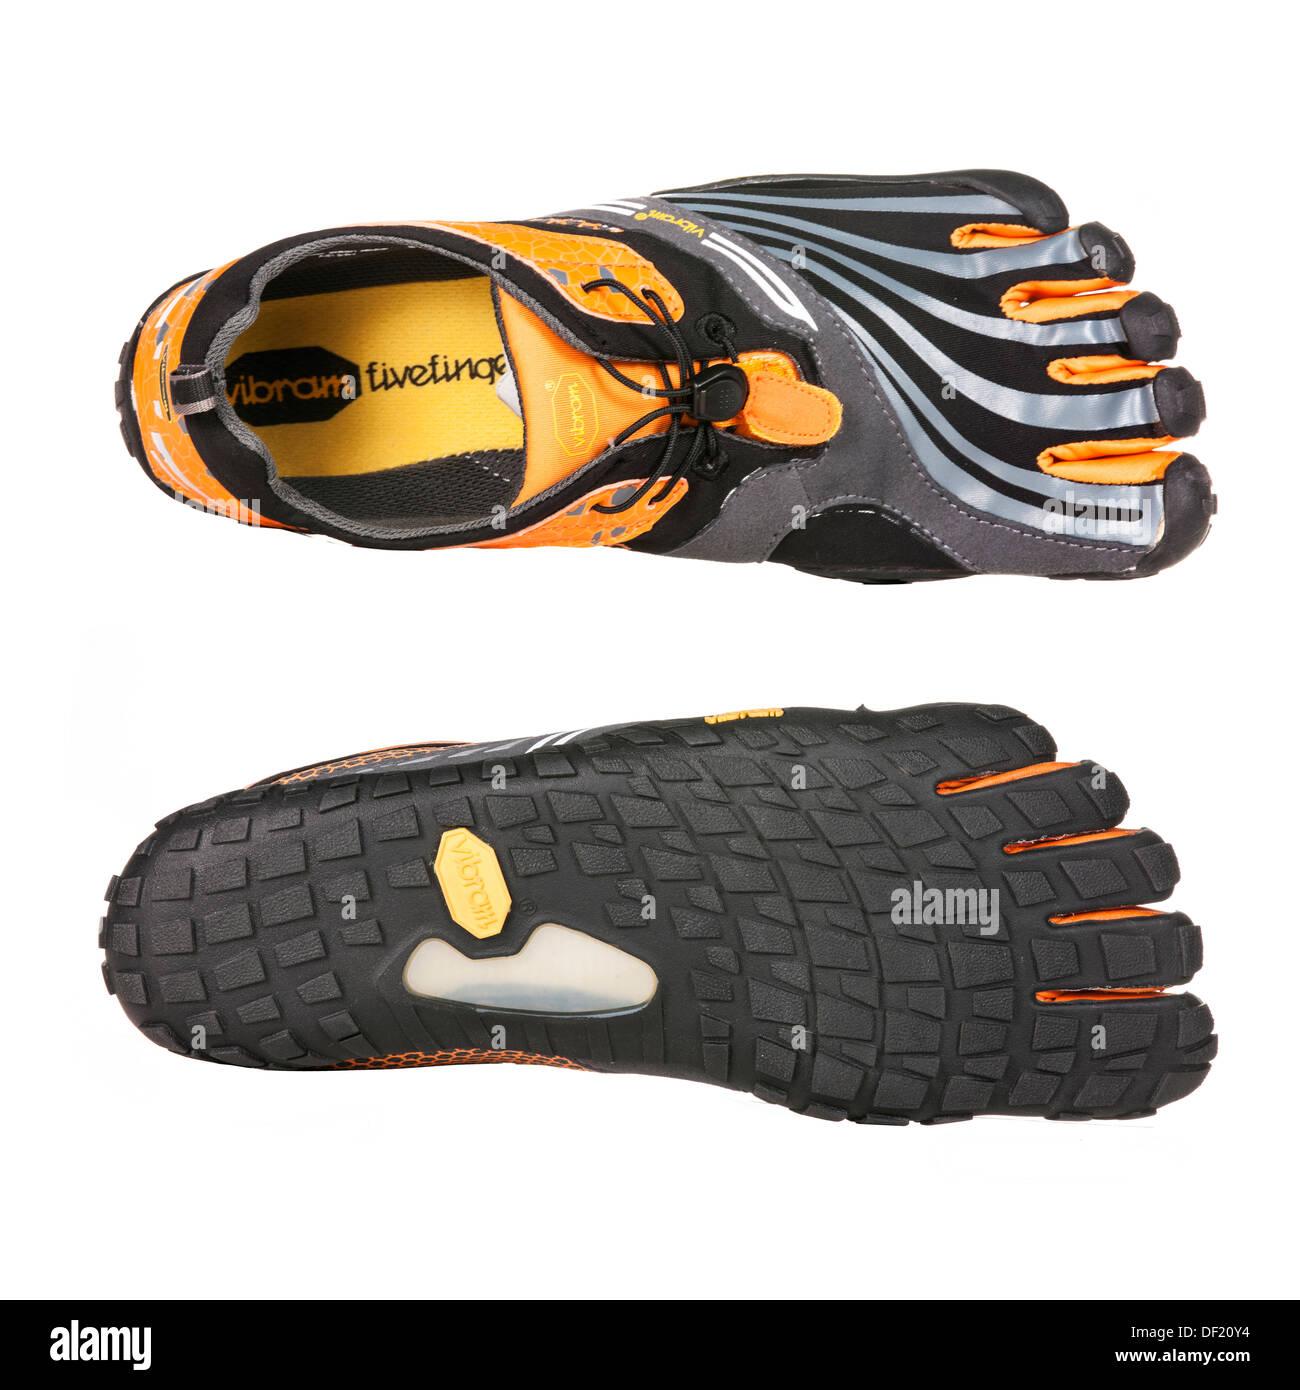 Vibram FiveFingers spyridon ls are barefoot running shoes isolated on white background. Stock Photo